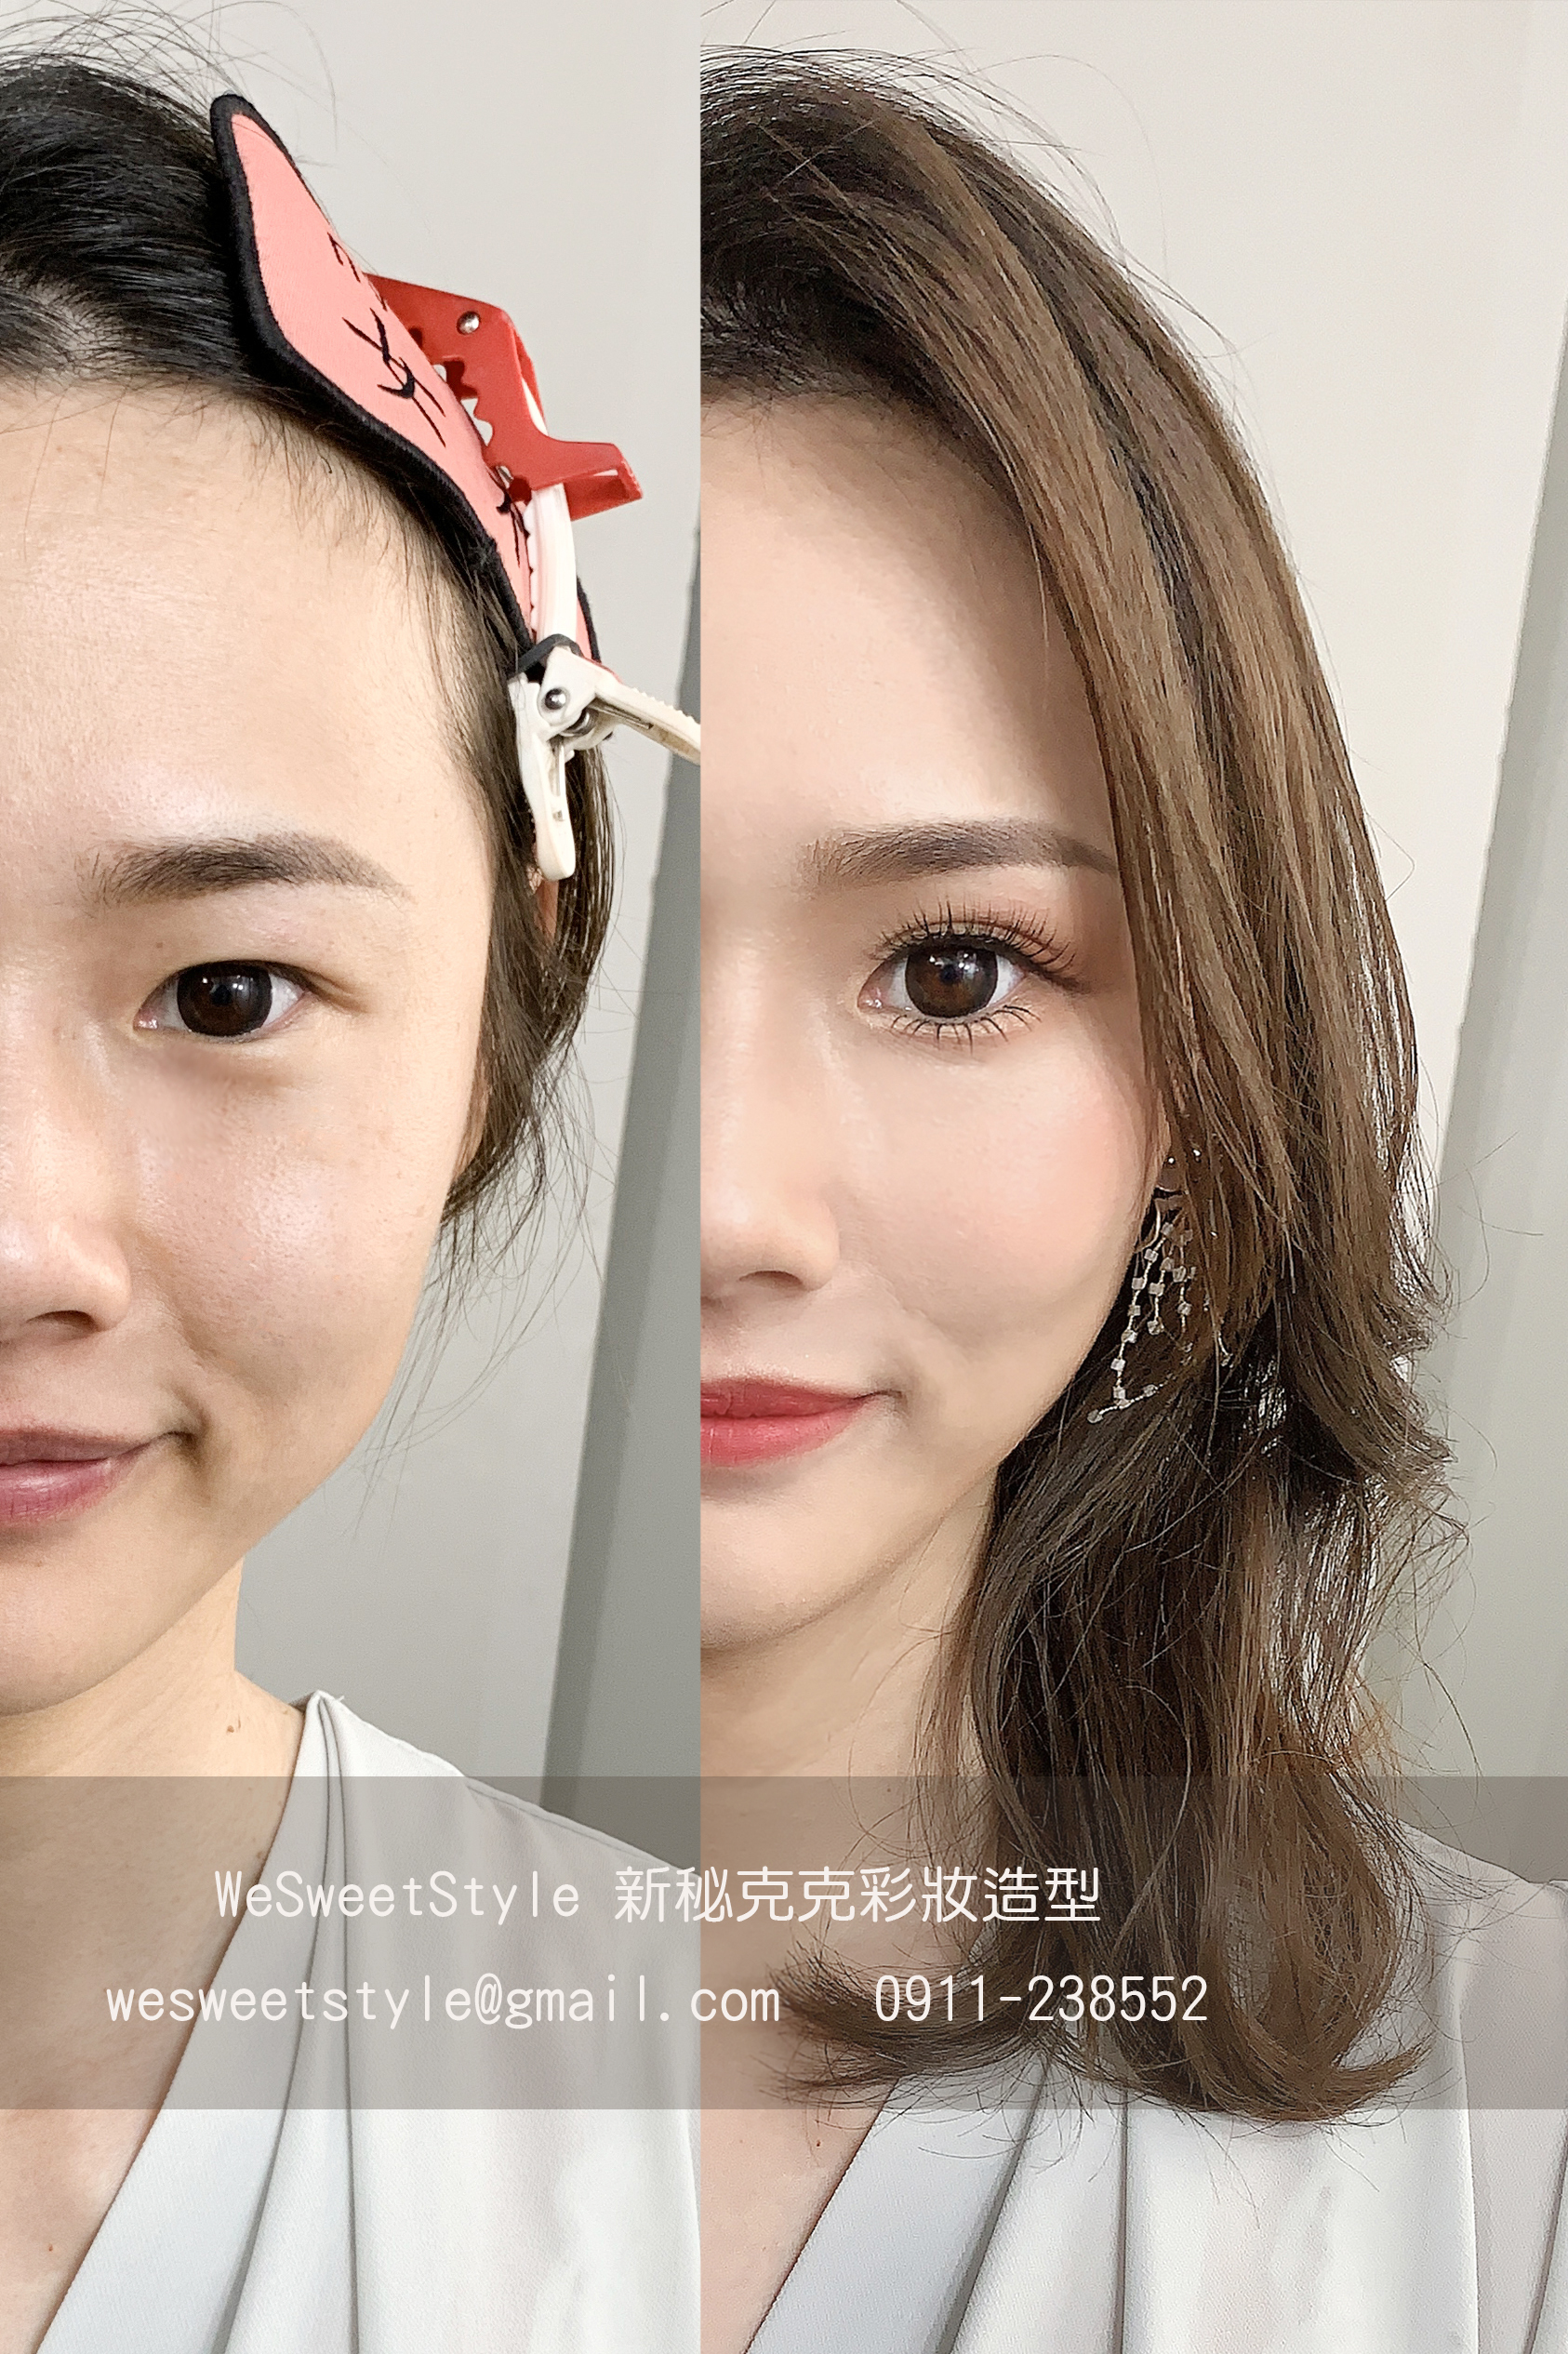 WeSweetStyle新秘克克 彩妝造型20200703-5